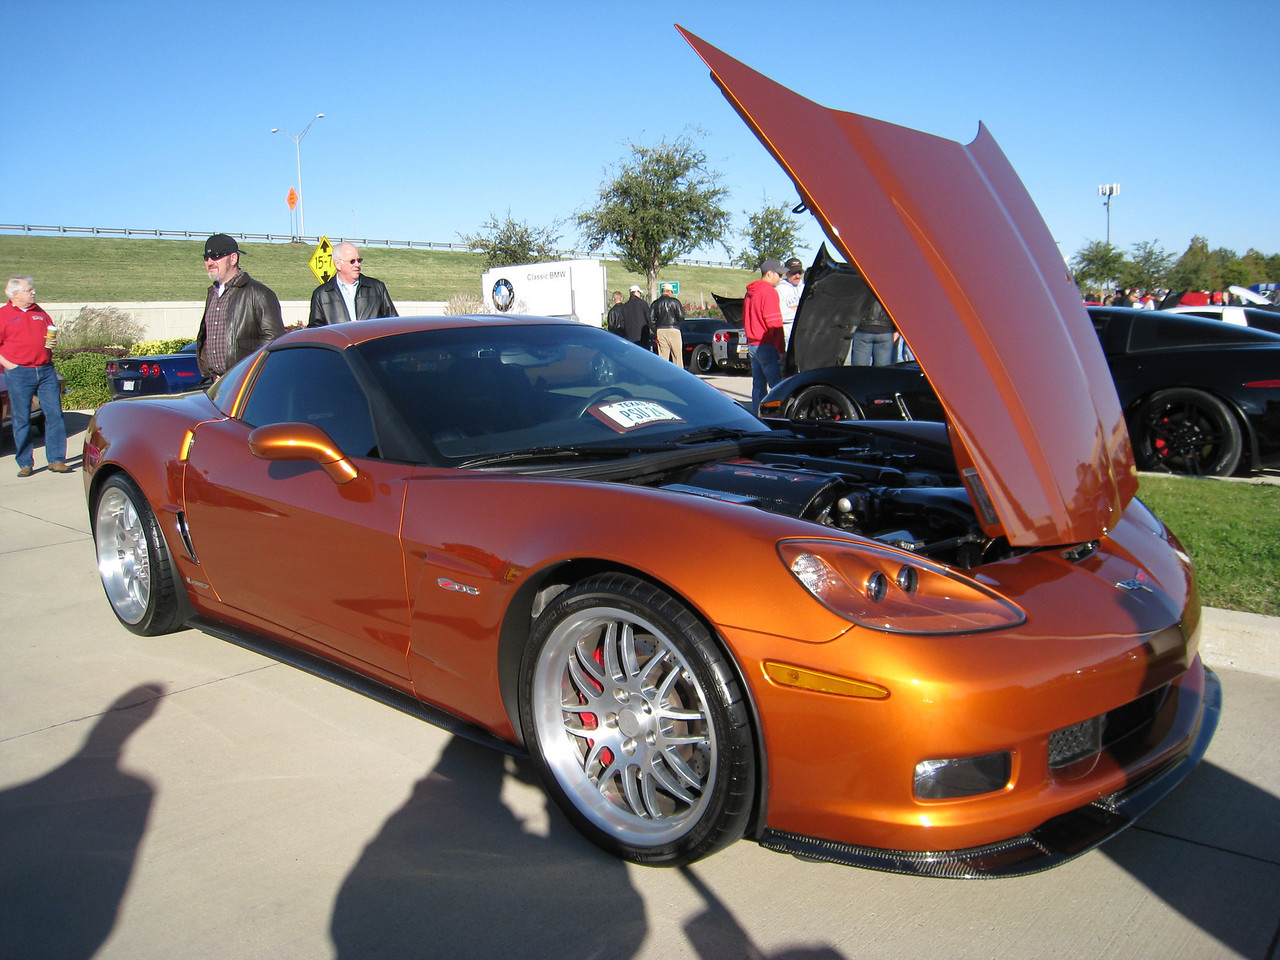 Corvette Z06 with sweet CCW wheels